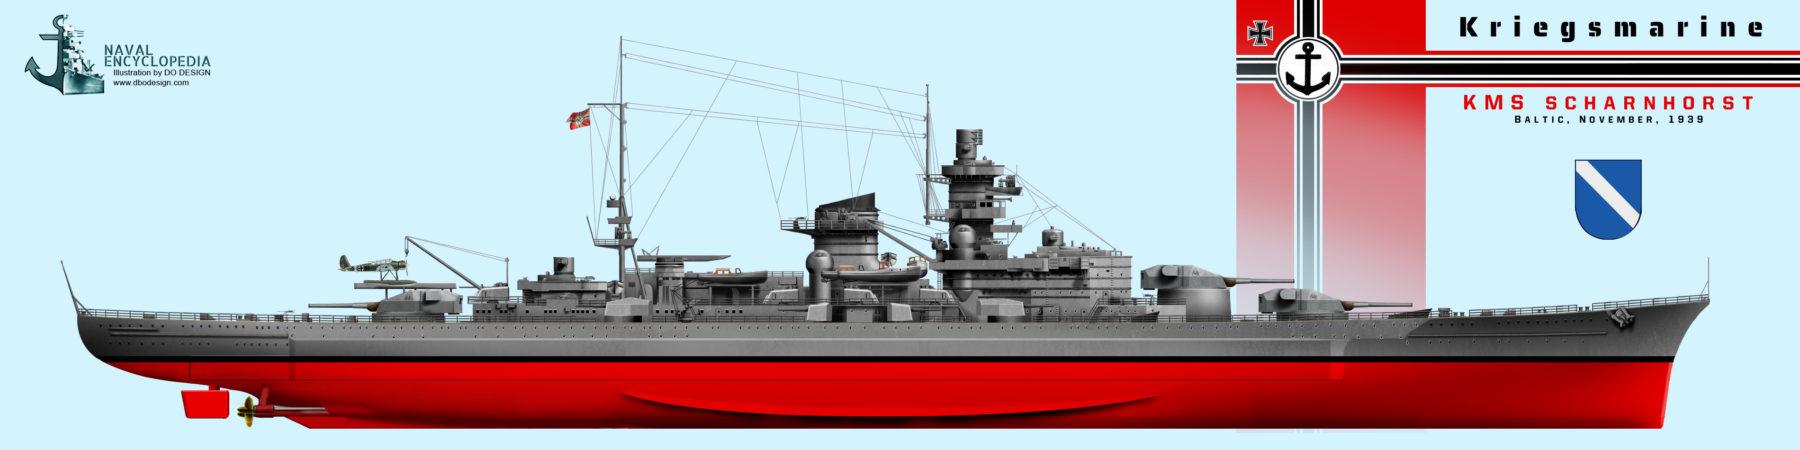 KMS Scharnhorst November 1939 training in the baltic